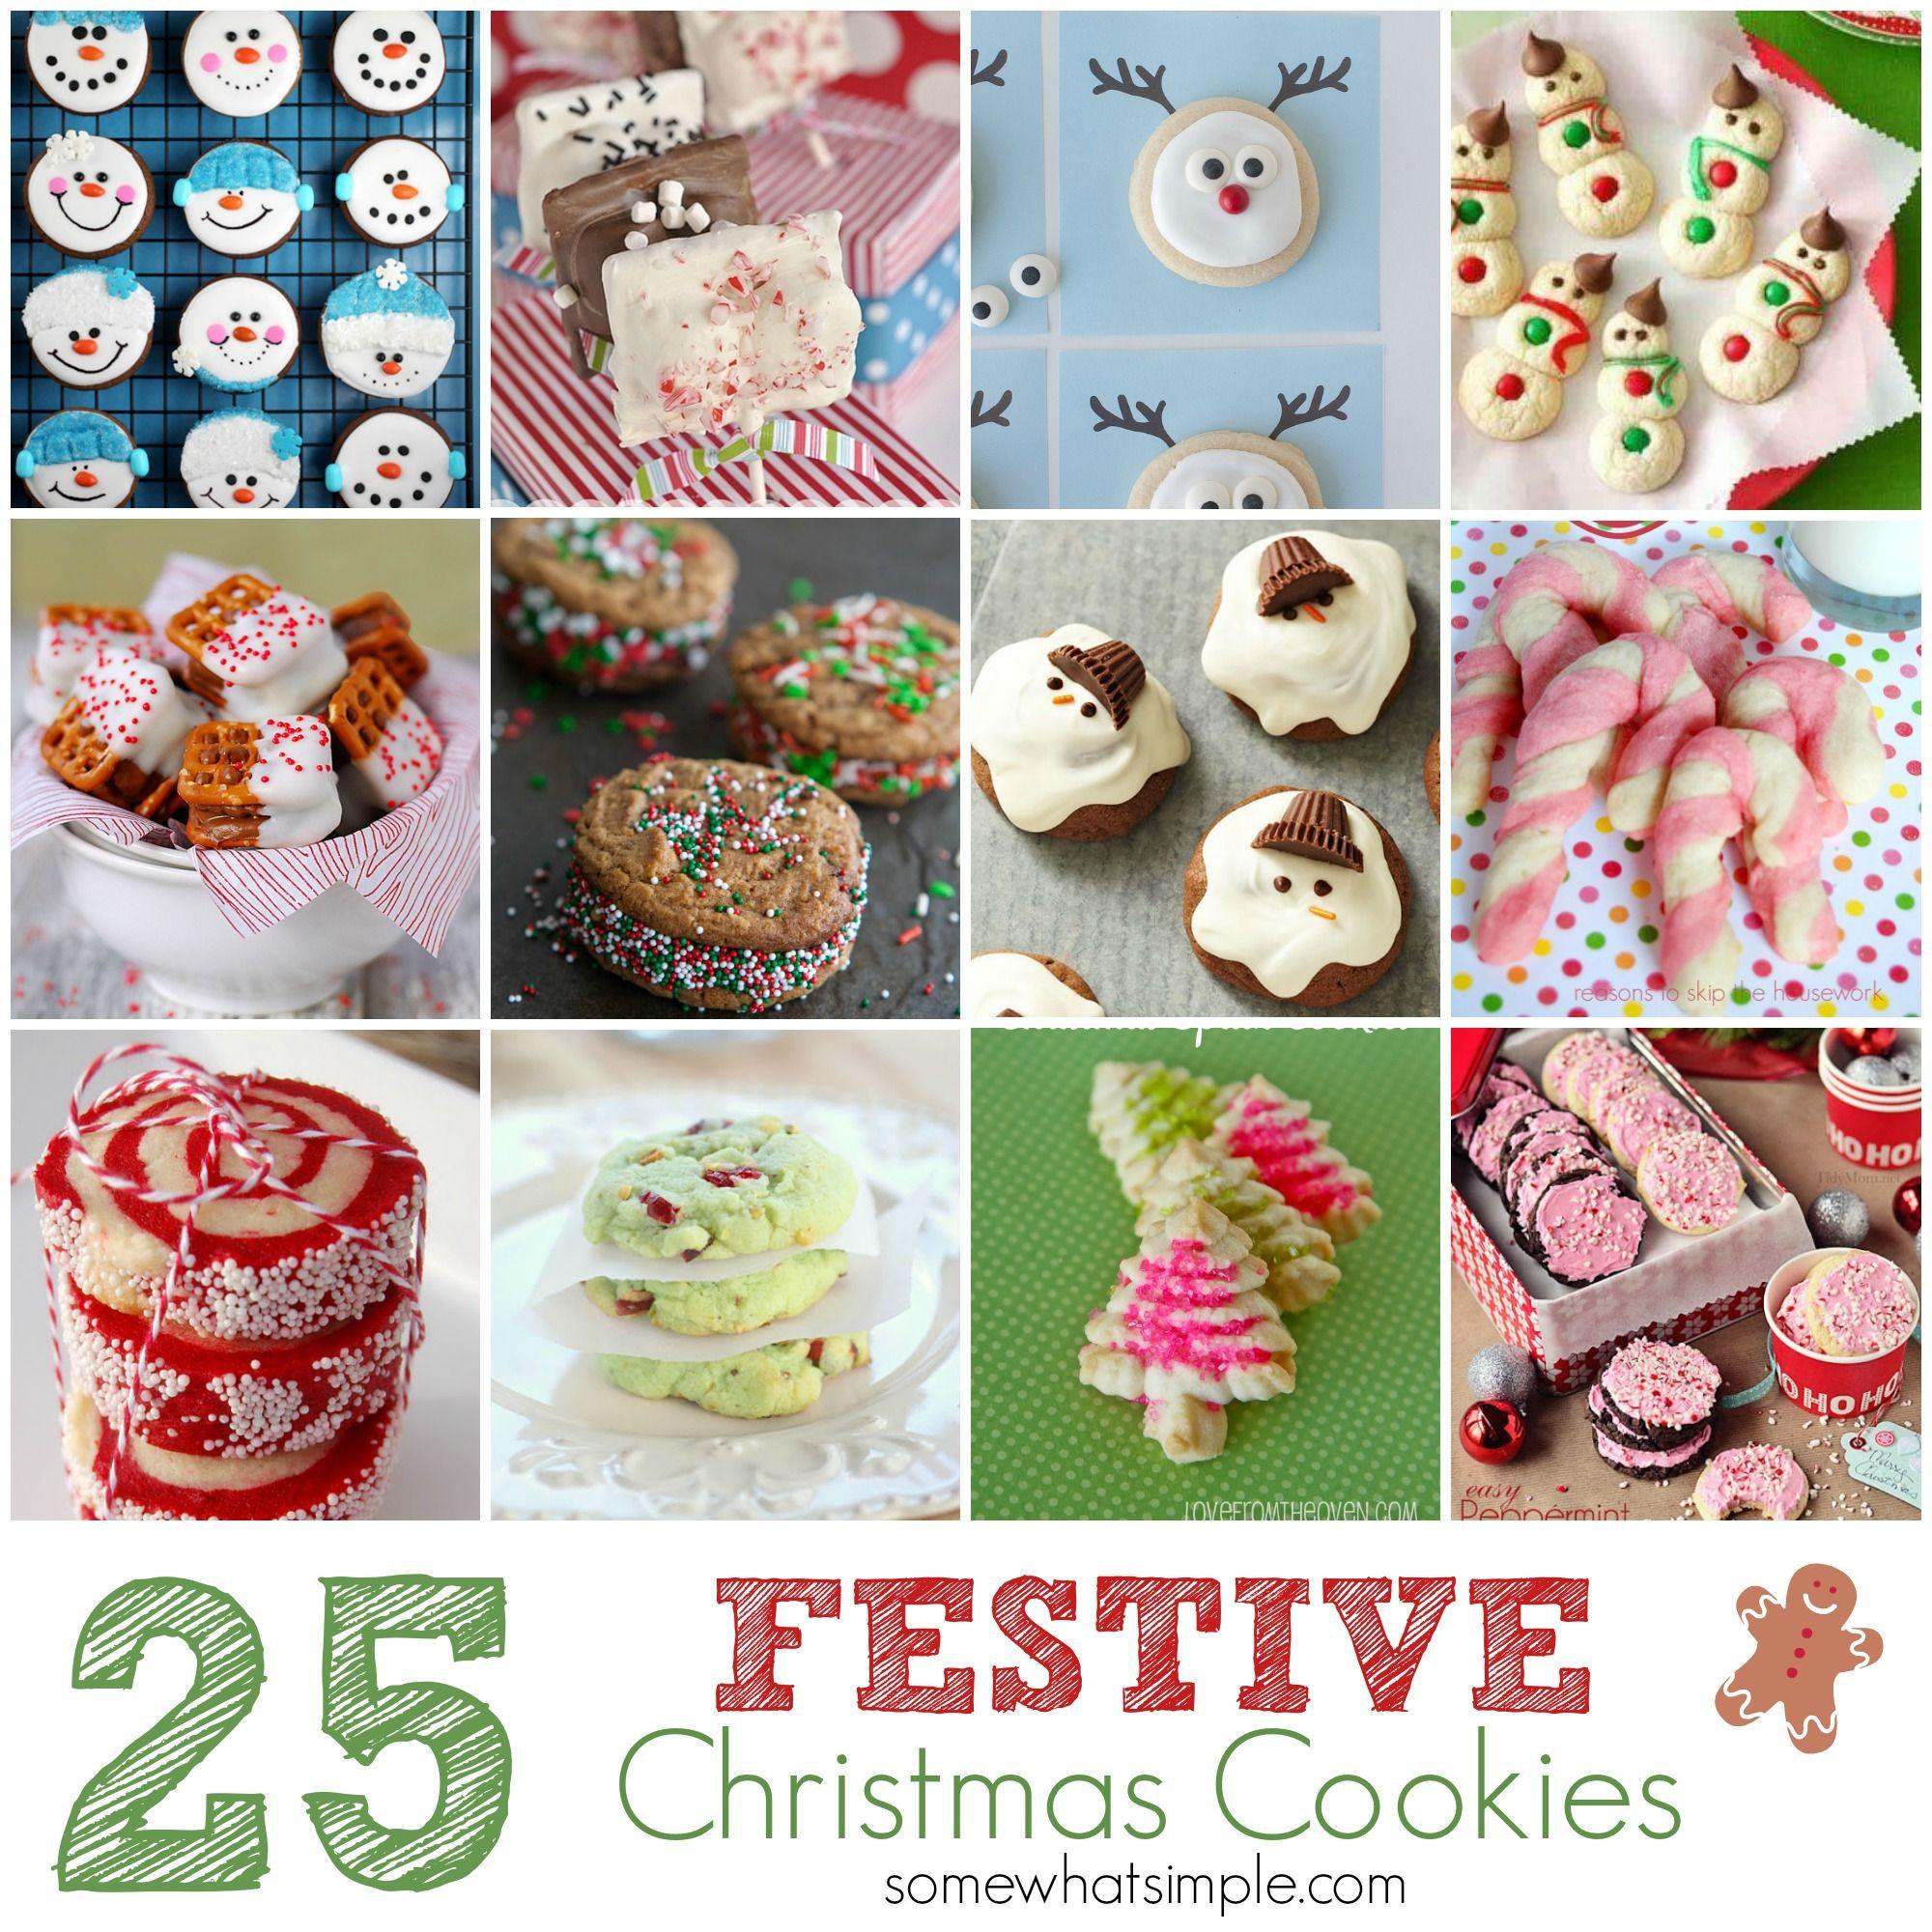 festive christmas cookies weihnachtsb ckerei geschenke. Black Bedroom Furniture Sets. Home Design Ideas